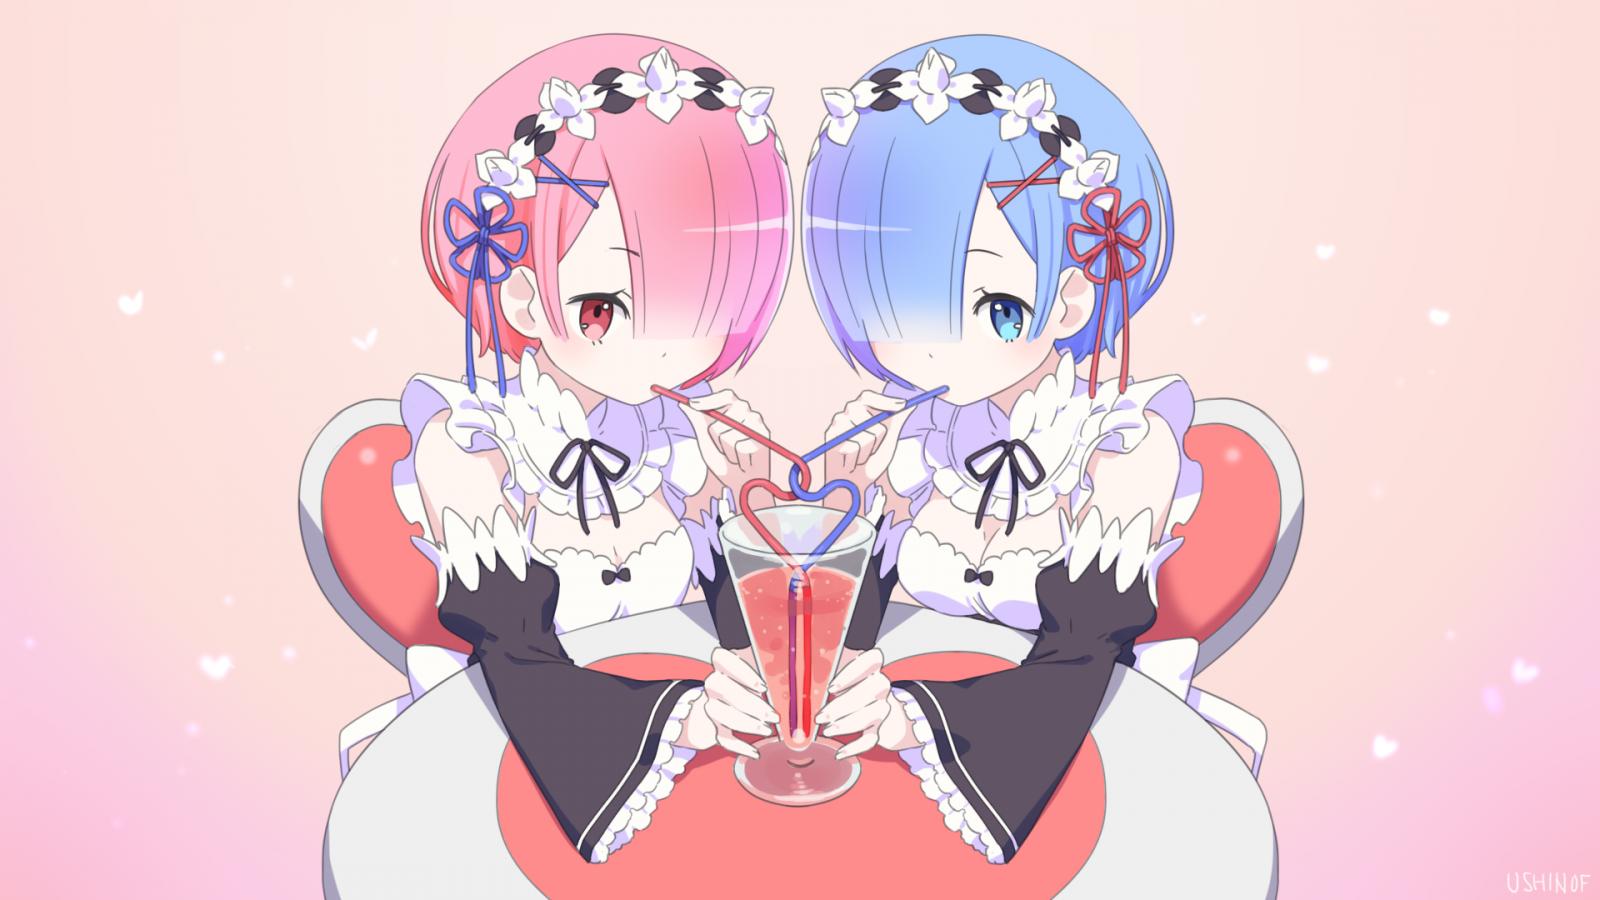 Wallpaper Anime Girls Anime Girls Eating Pink Re Zero